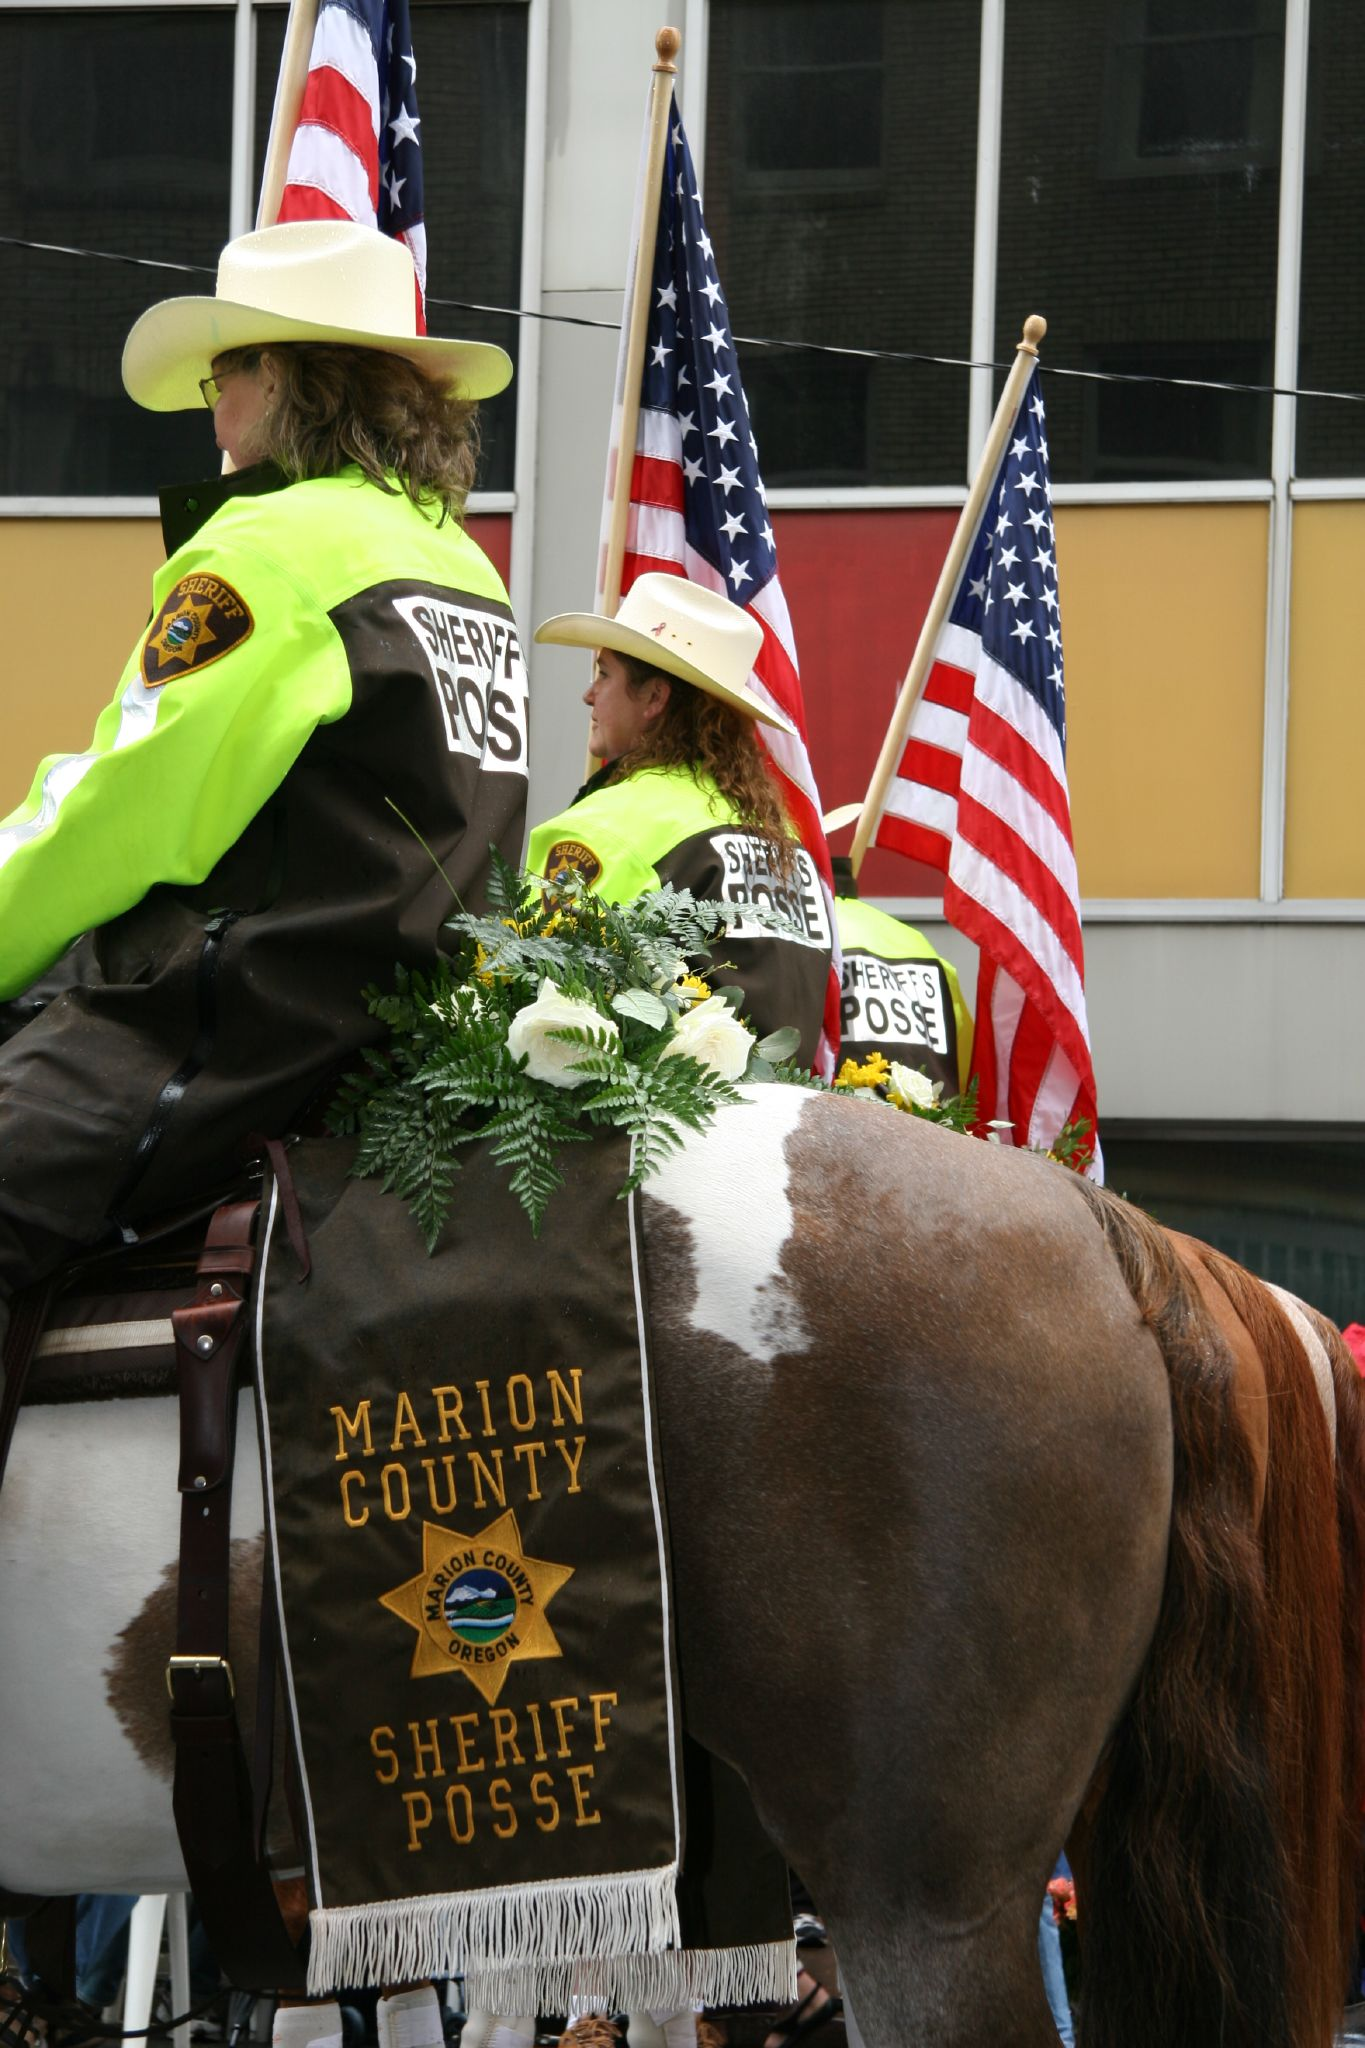 File:Marion County Sheriff's Posse jpg - Wikimedia Commons